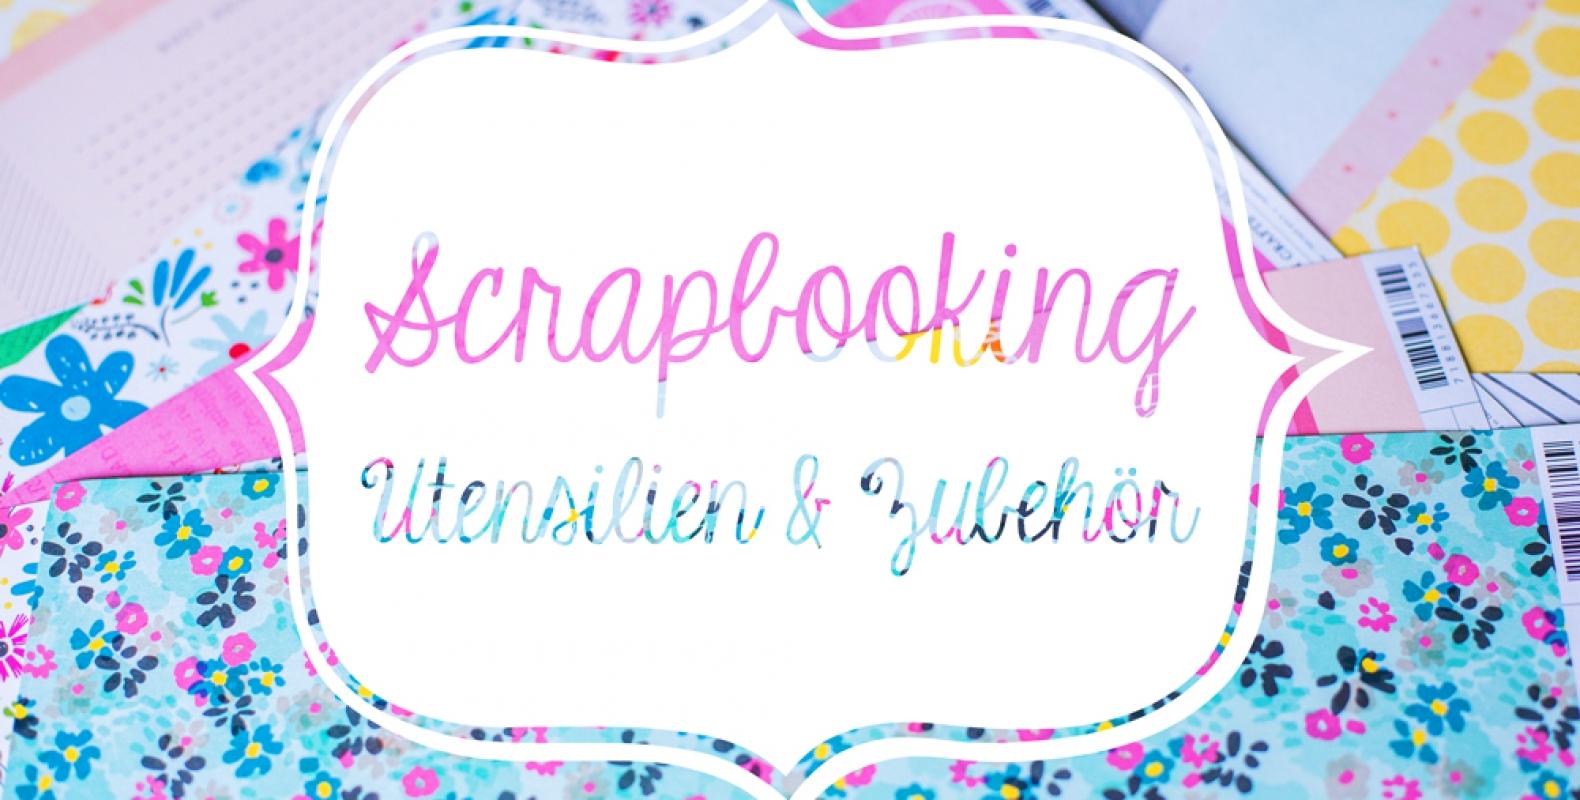 Scrapbooking mit Project Life #2 – Utensilien & Zubehör